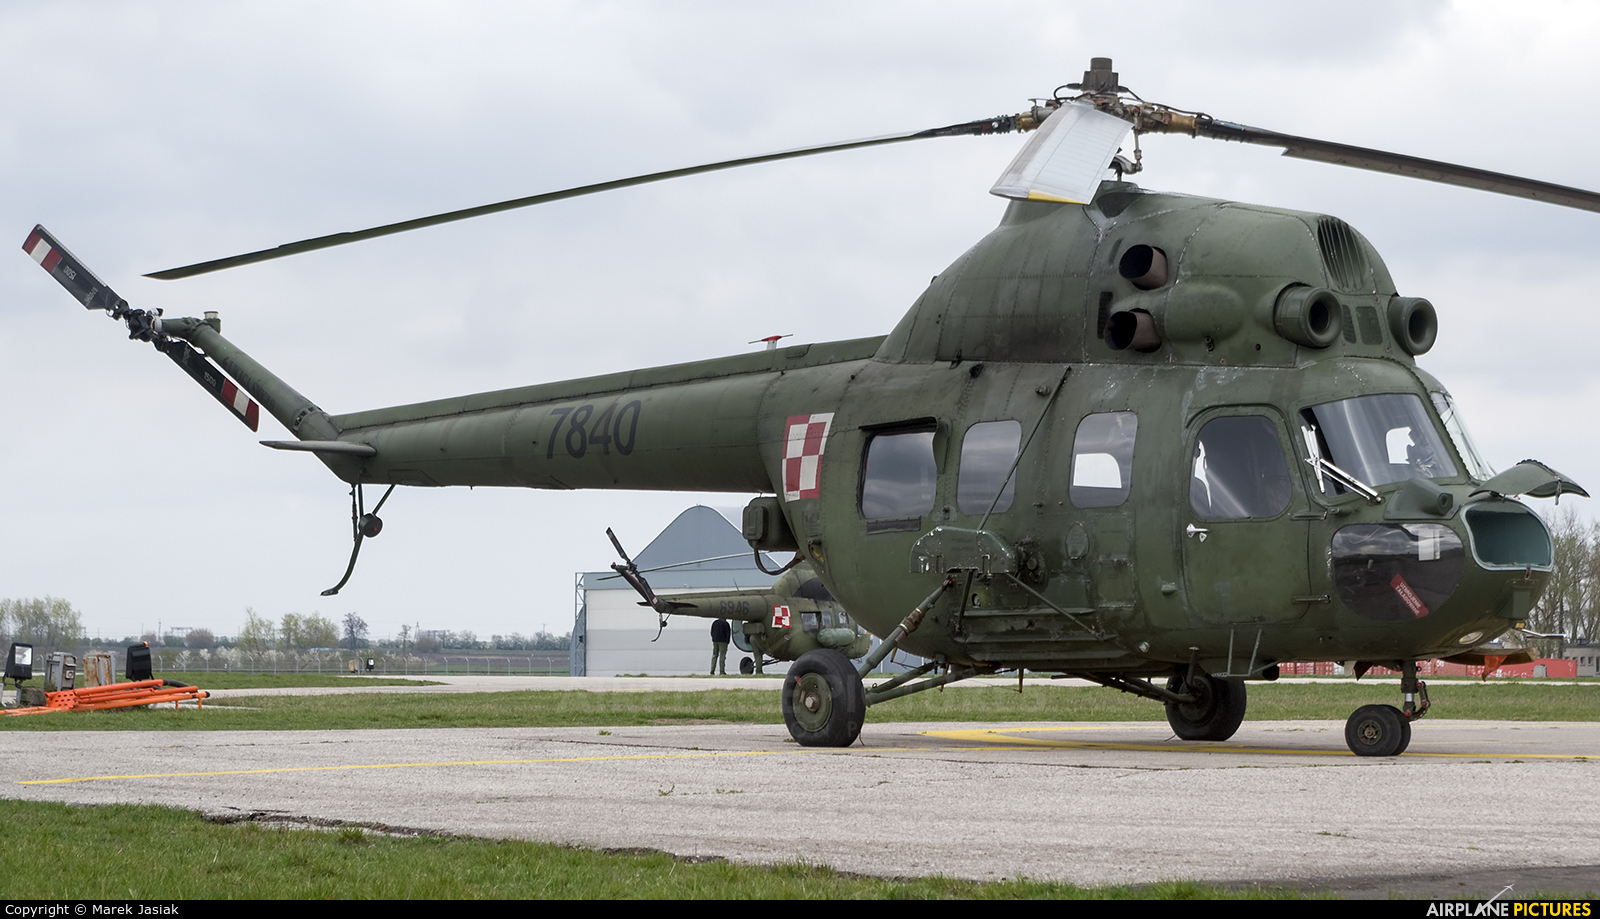 Poland - Army 7840 aircraft at Inowrocław - Latkowo